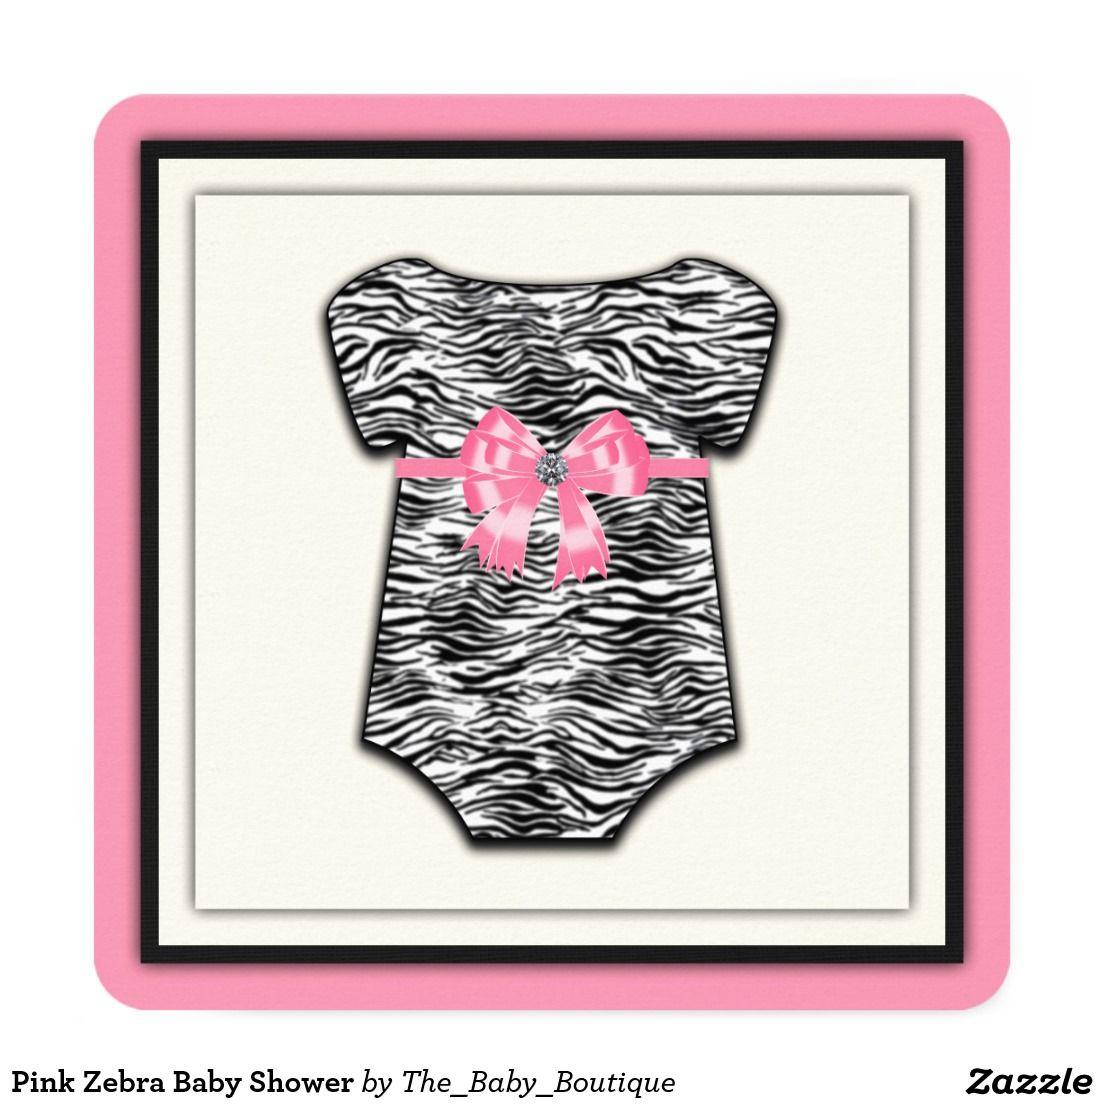 Pink Zebra Baby Shower 525x525 Square Paper Invitation Card Girl